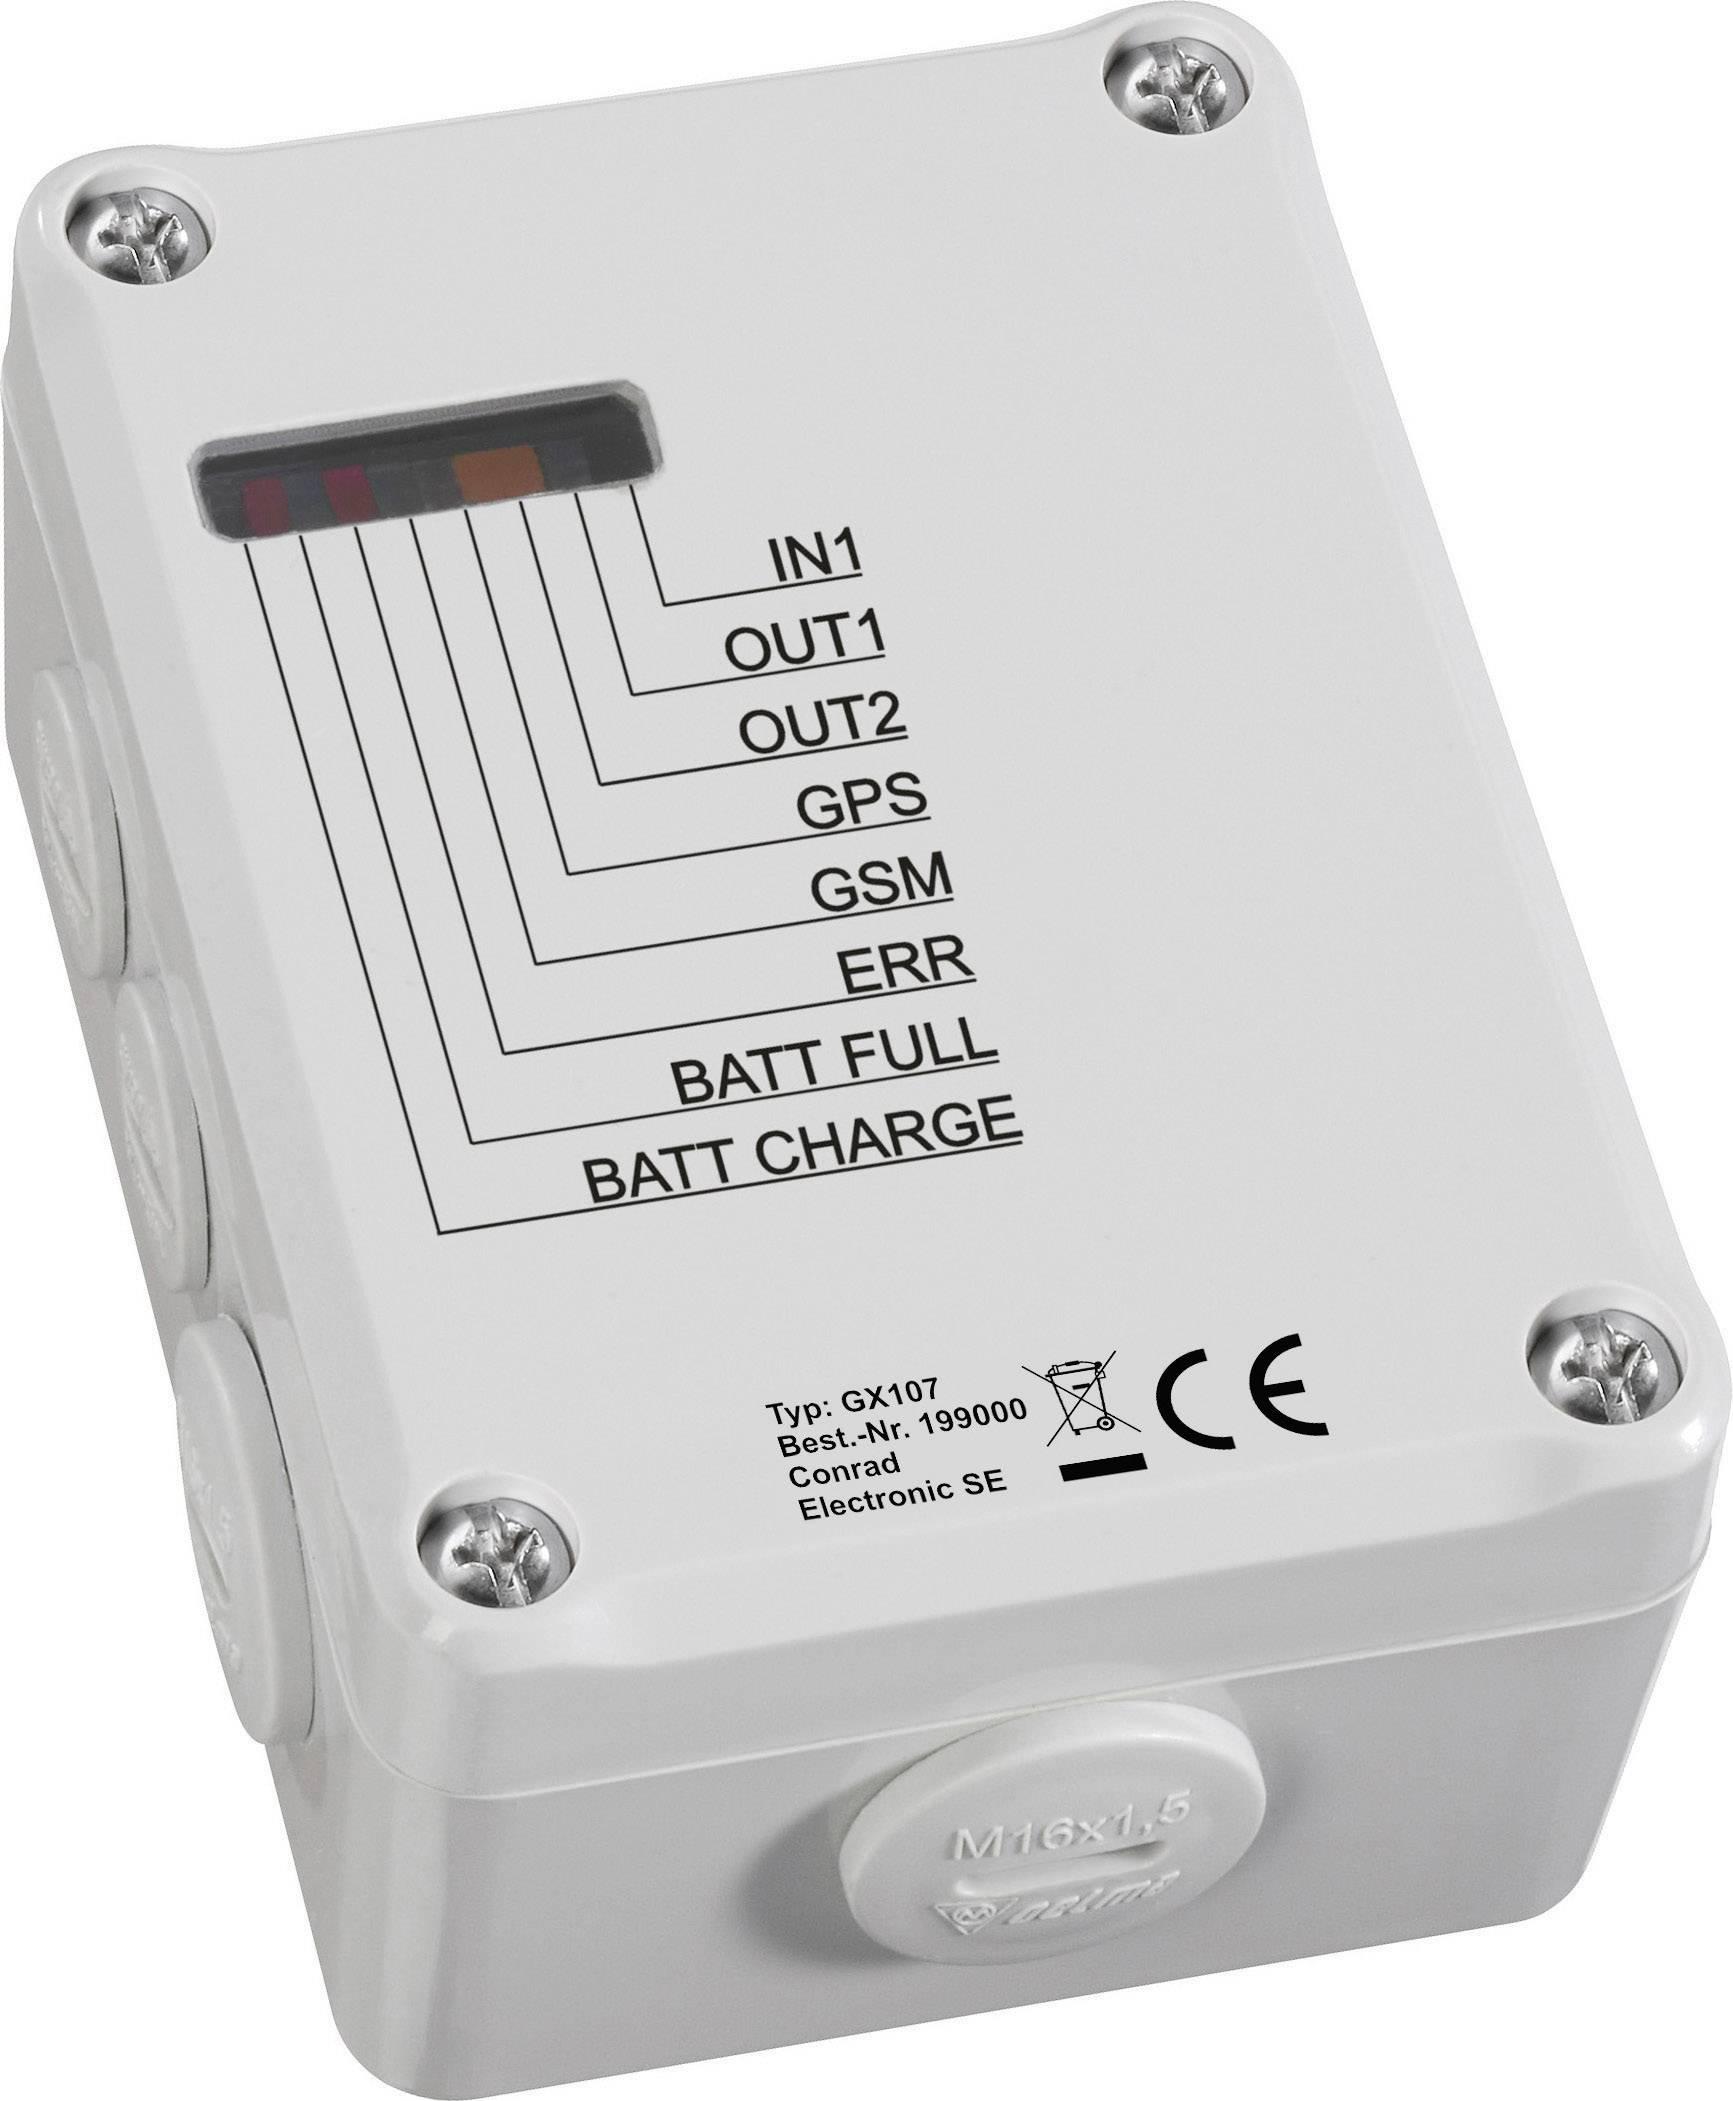 Konfiguračný nástroj/ GSM modul Conrad Components GX107, 5 V/DC, 32 V/DC